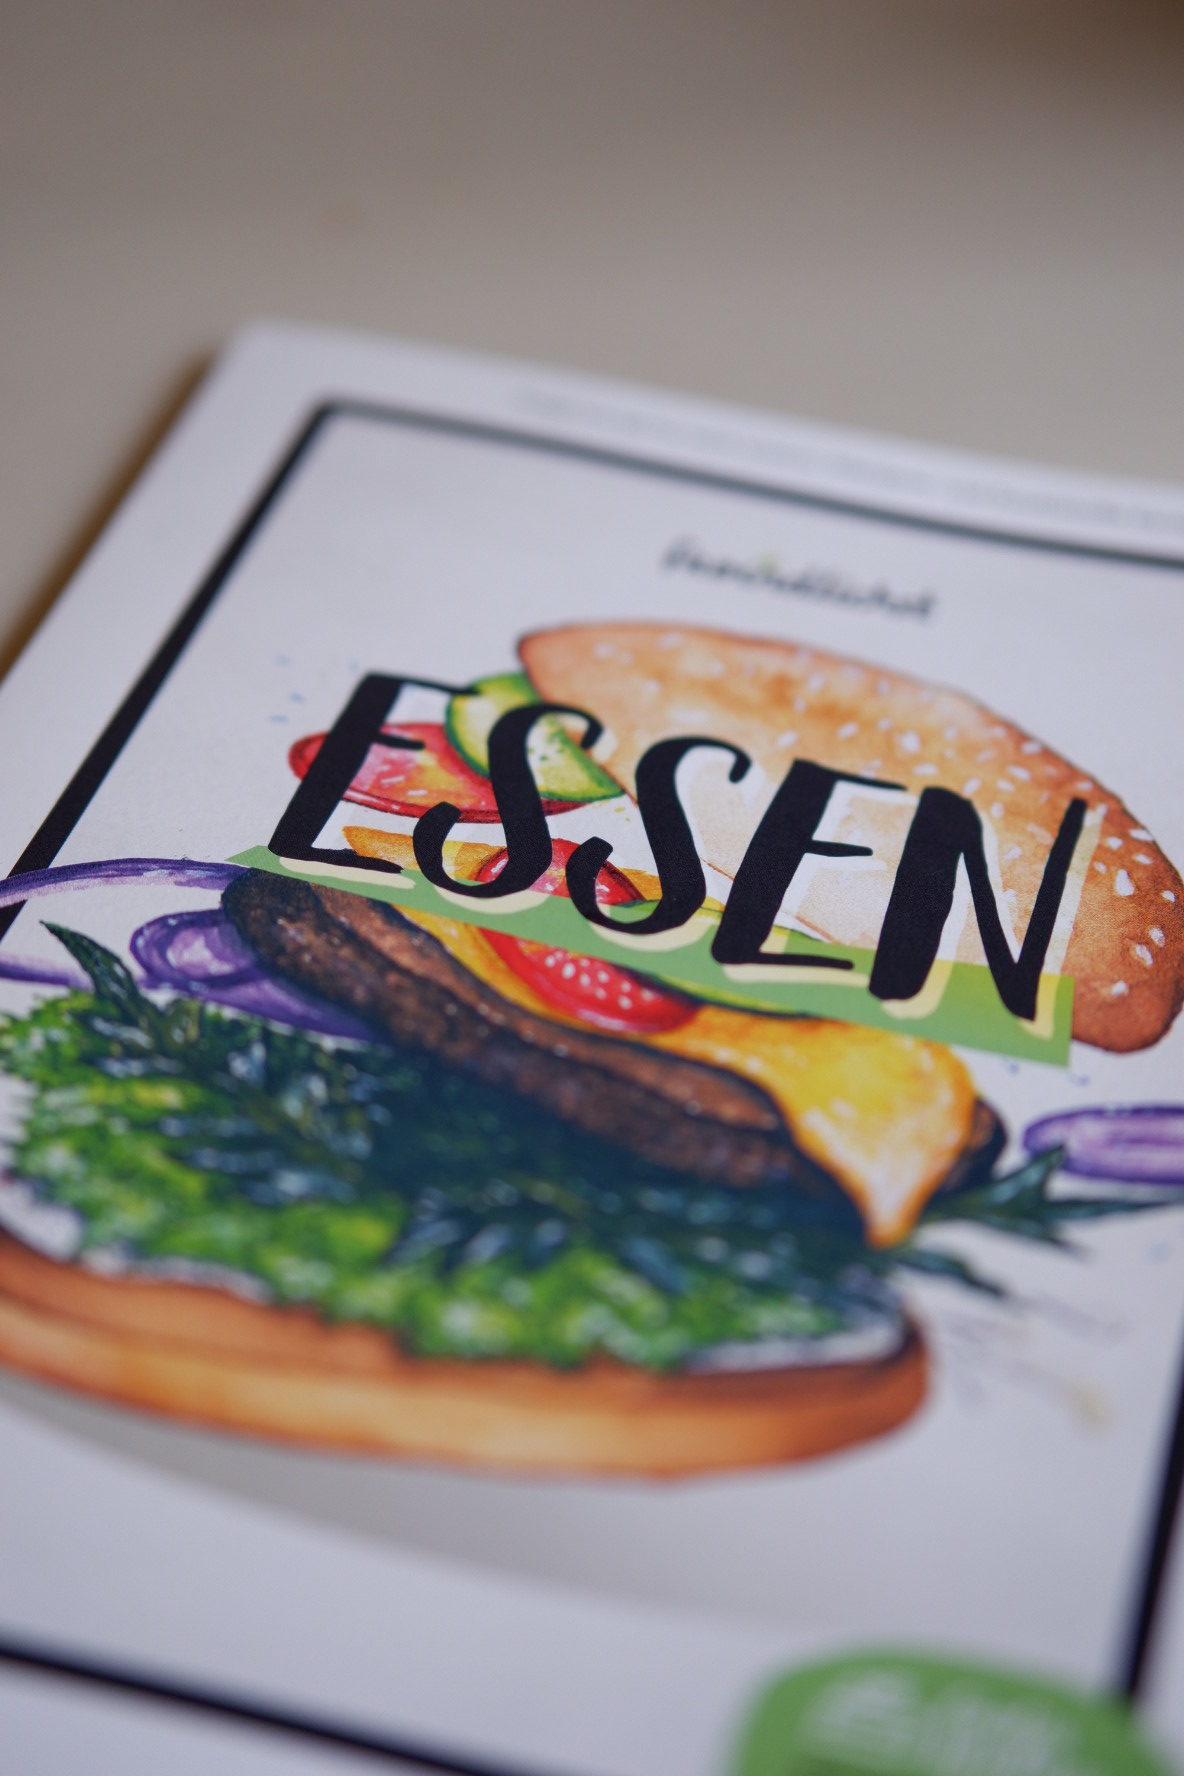 Veganer Hamburg Foodguide – Meine Top 5 Restaurants